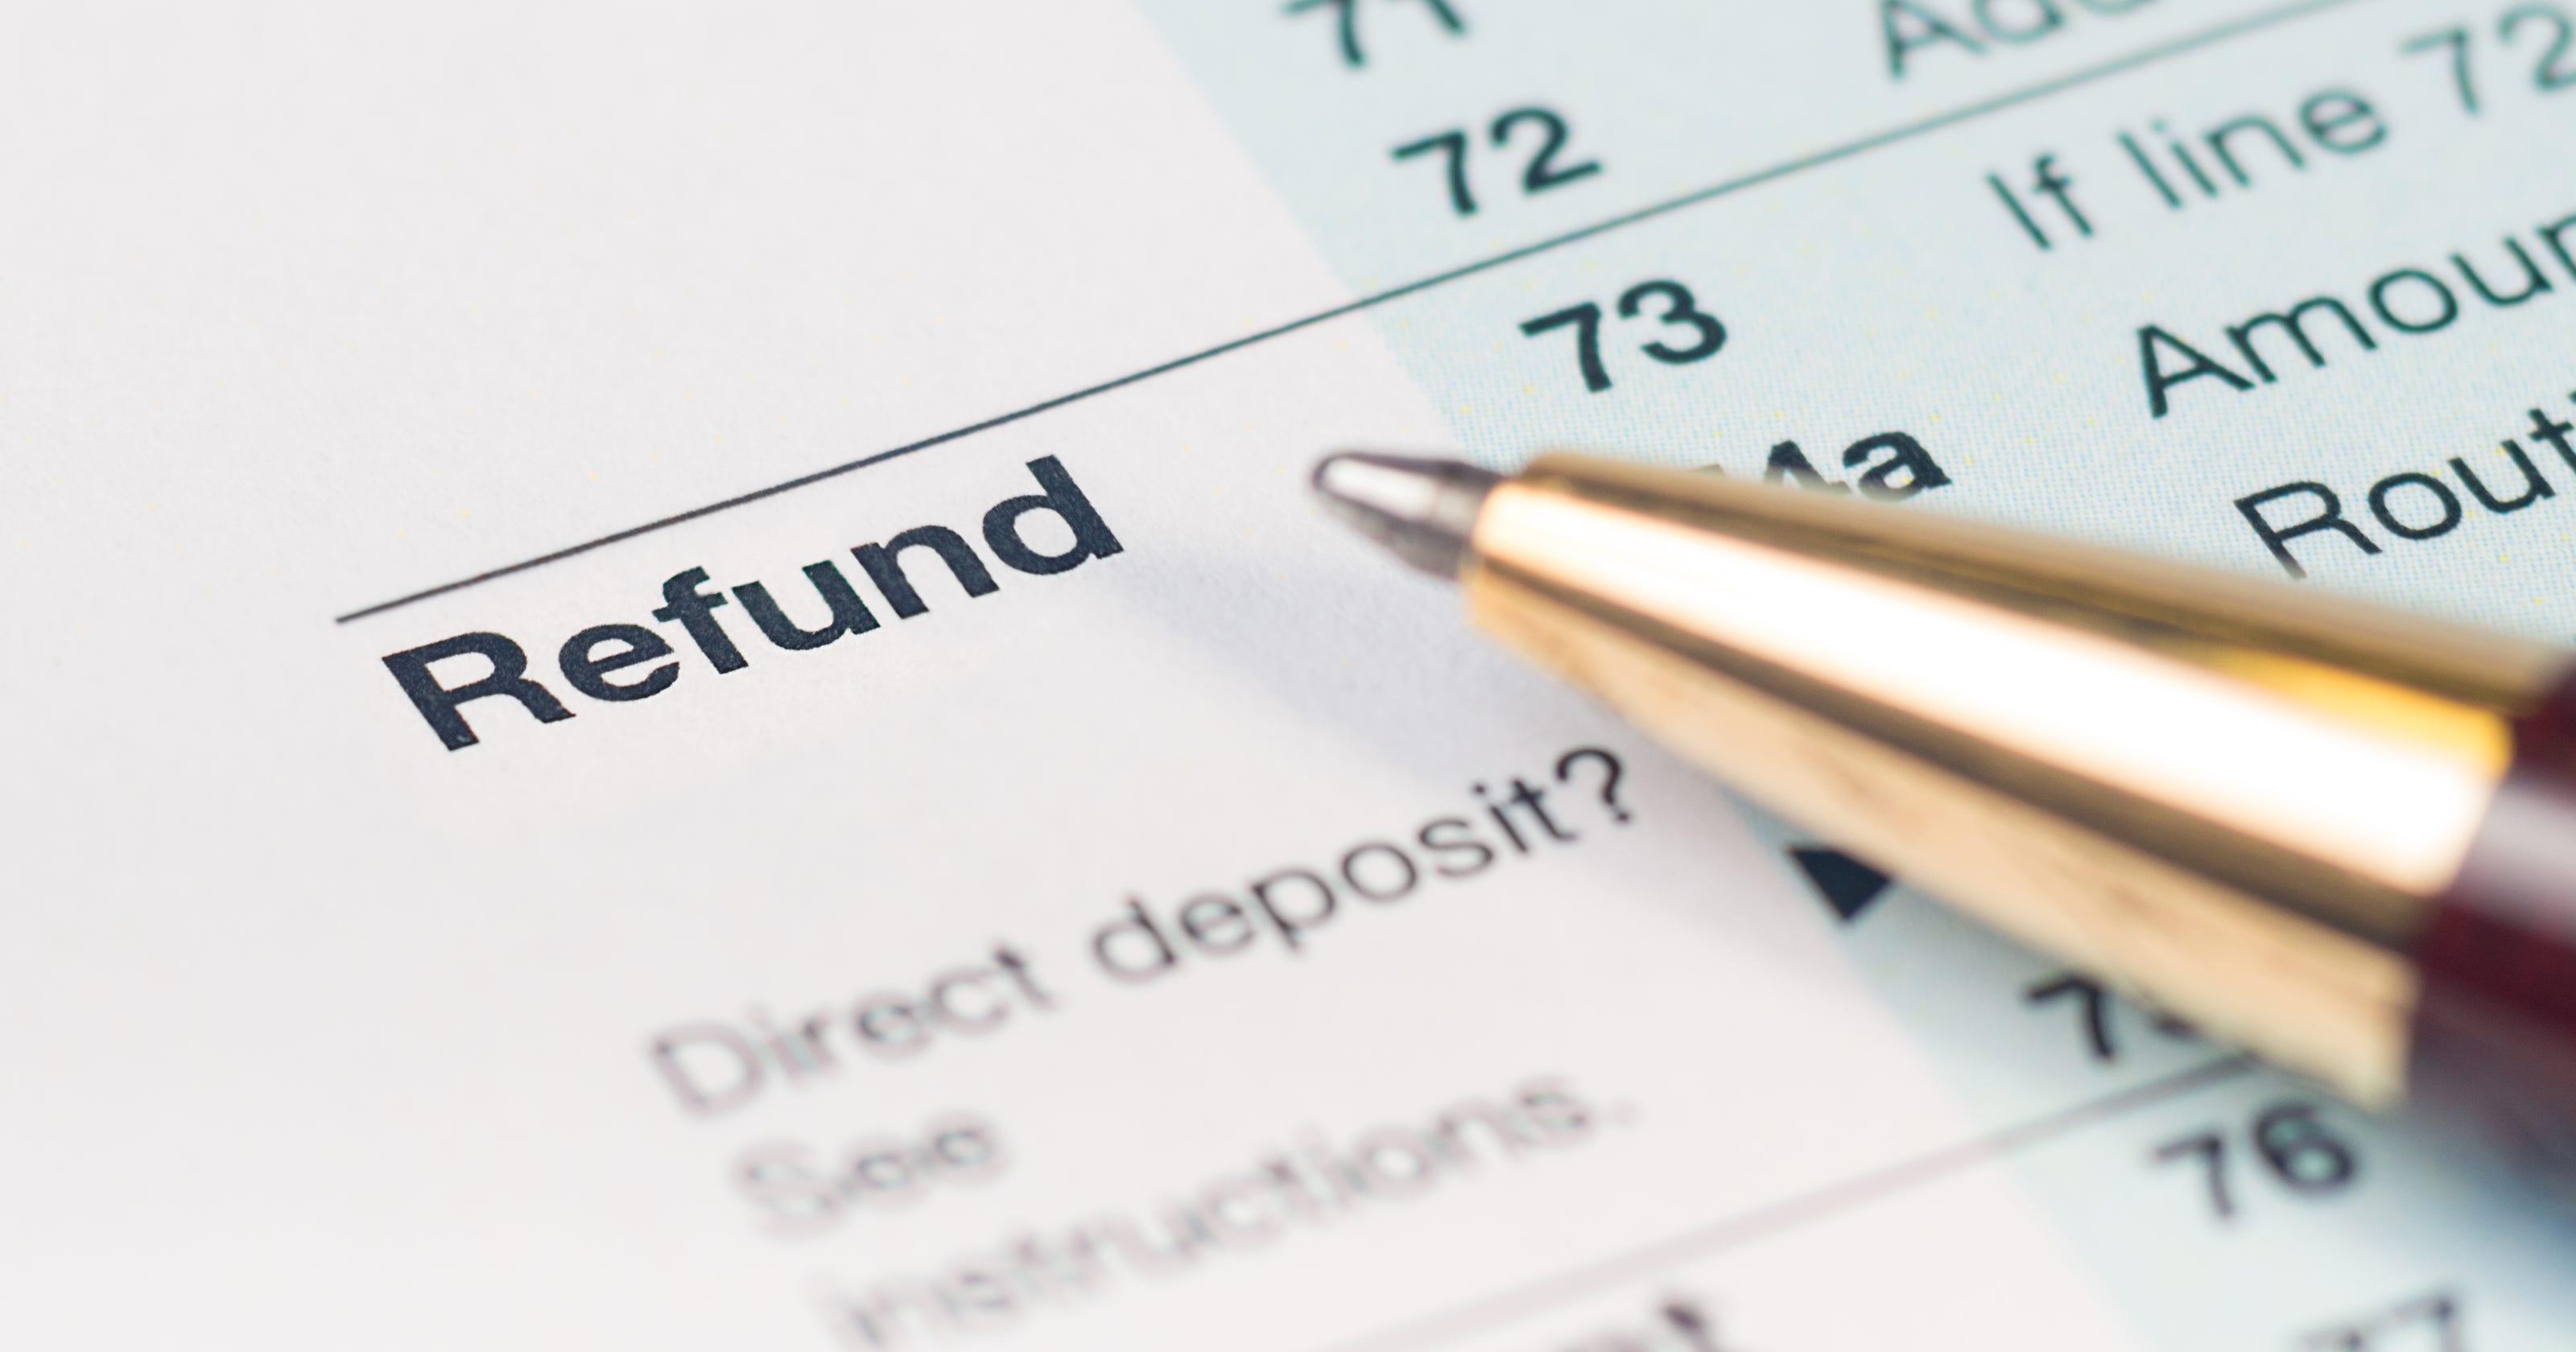 When will Iowans get their 2018 tax refunds?